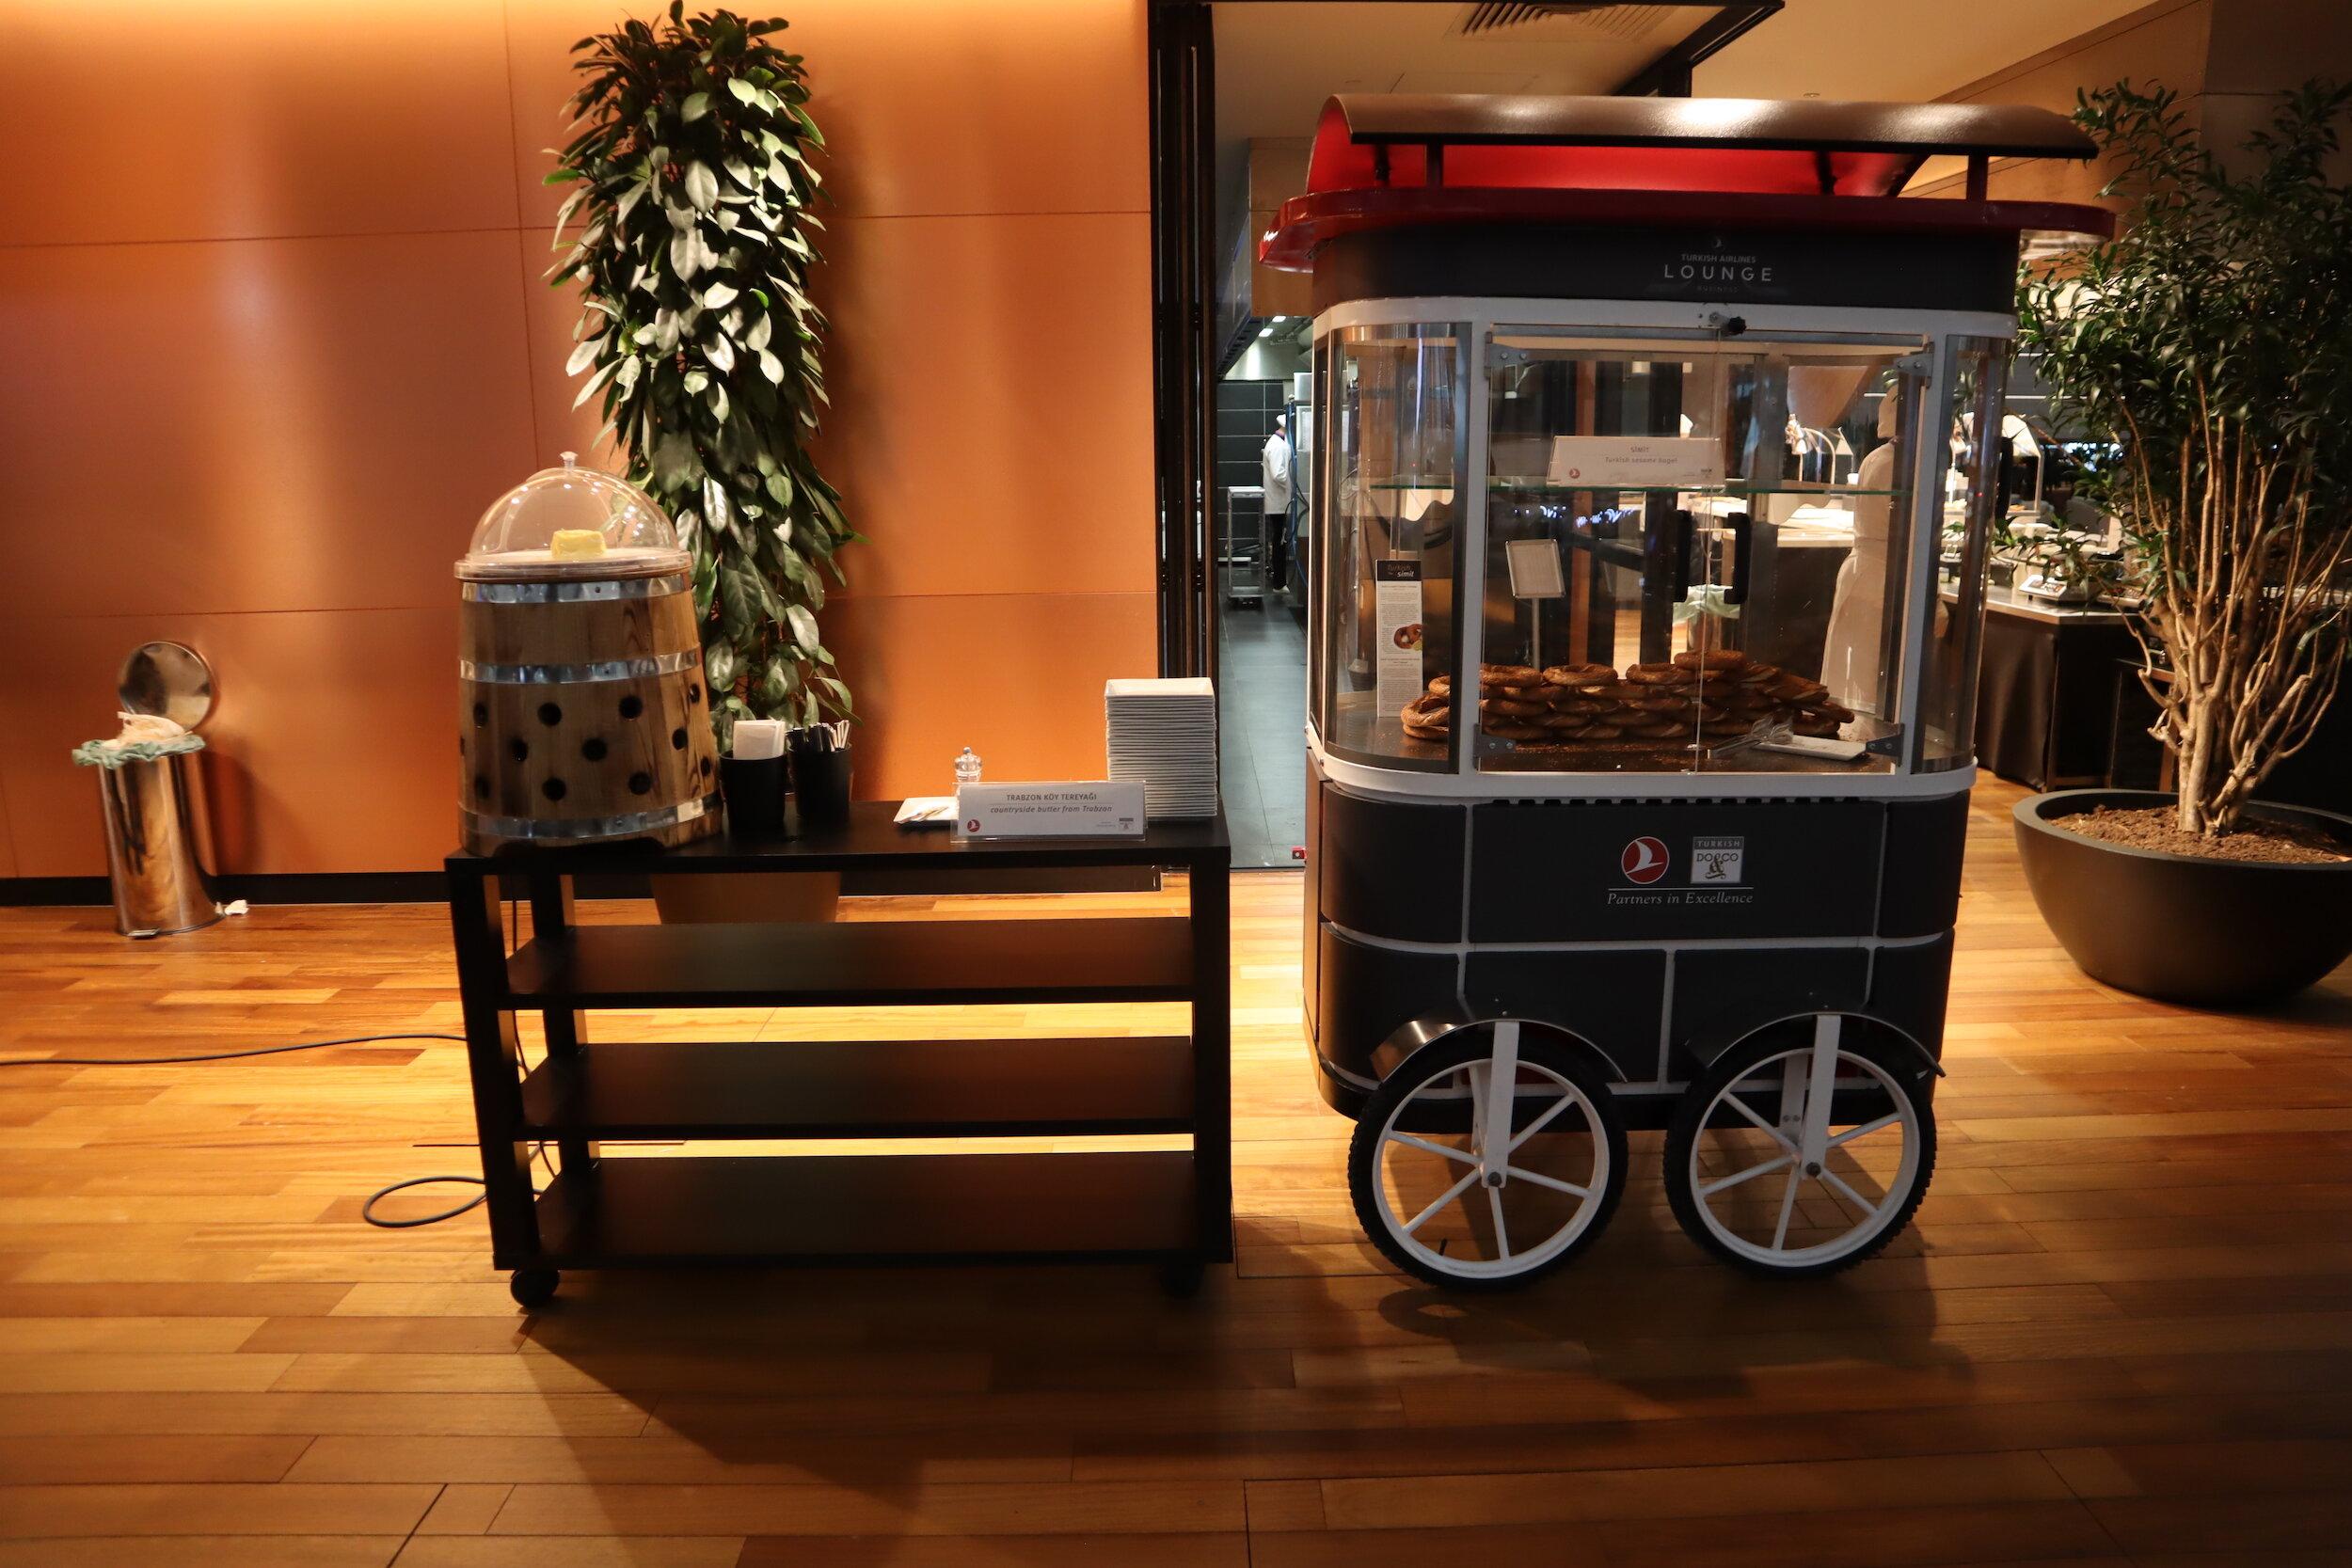 Turkish Airlines Business Lounge Istanbul – Soft pretzel station